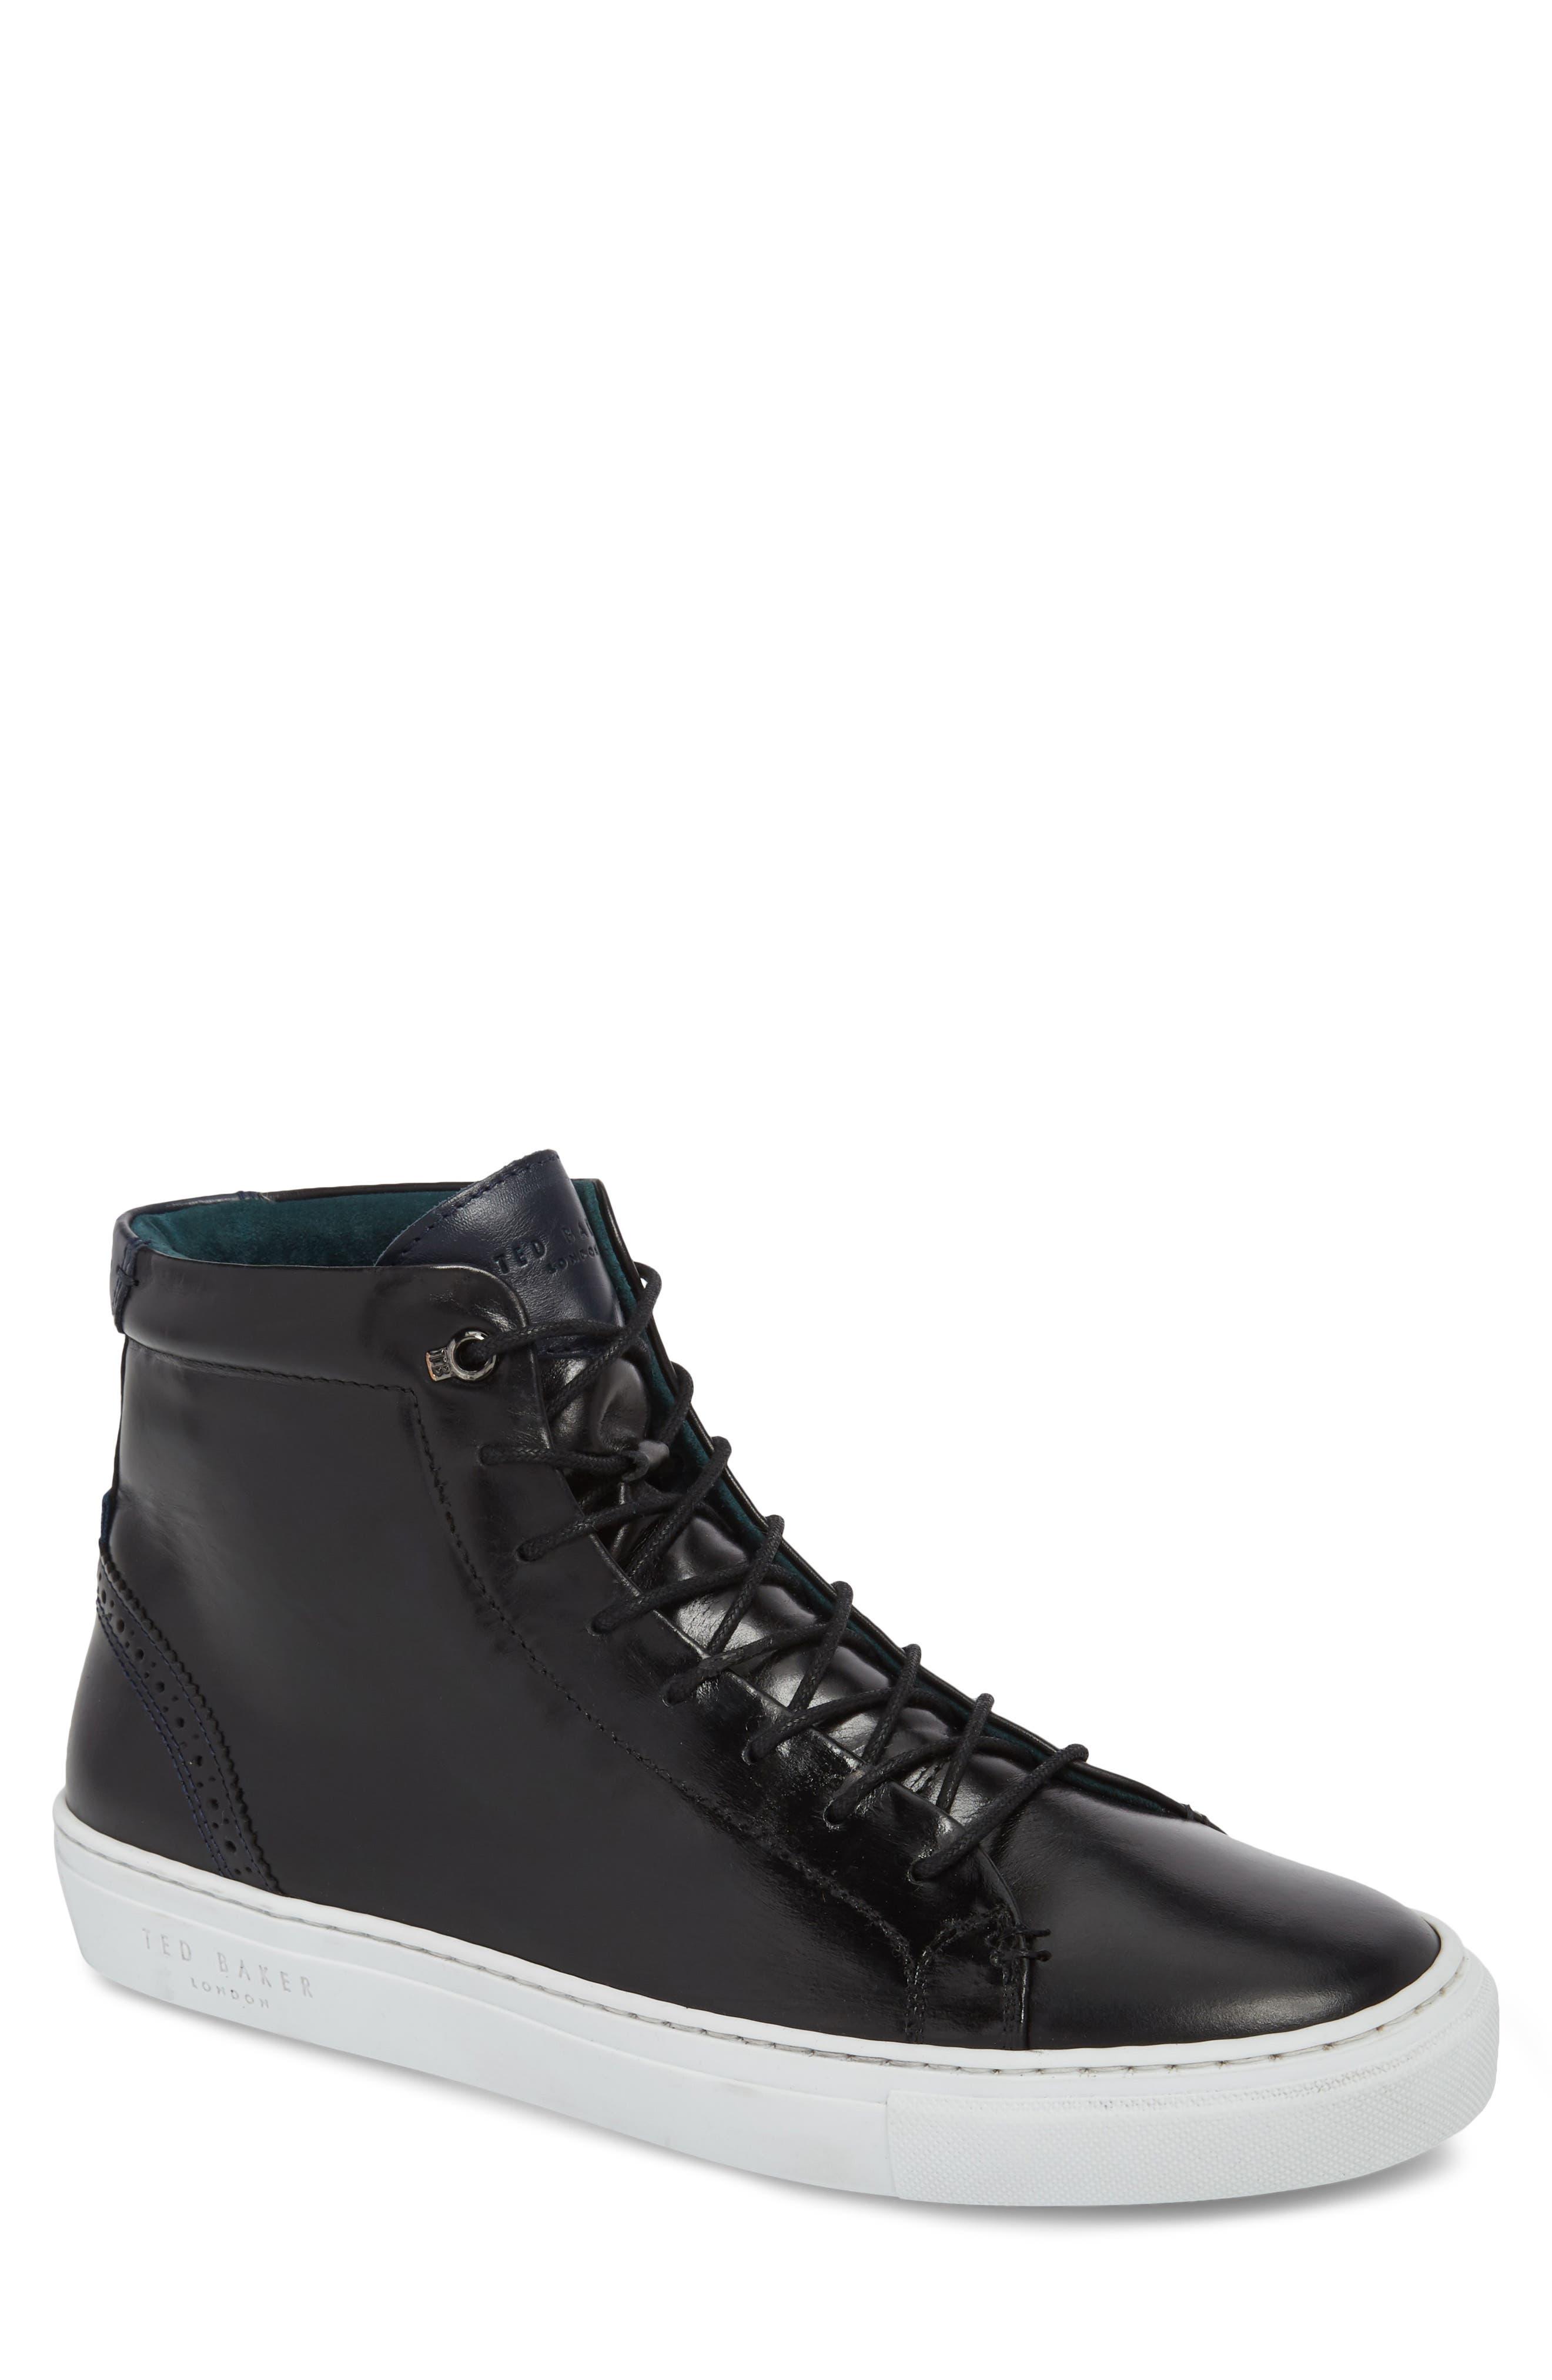 Monerkk High Top Sneaker,                             Main thumbnail 1, color,                             001